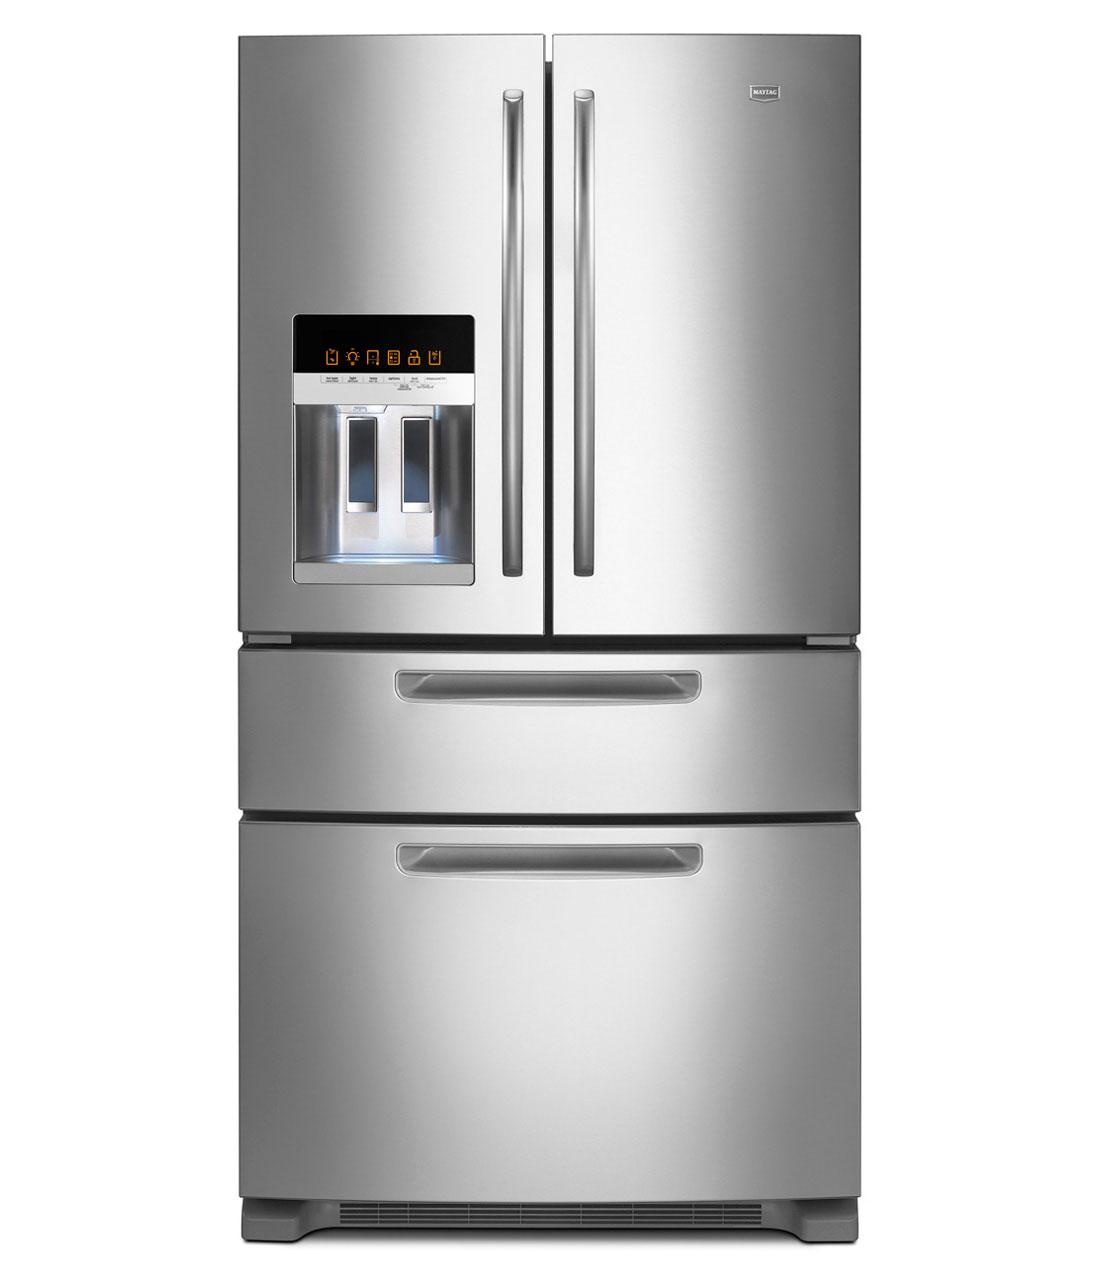 Blog bottom door freezer french maytag mff2557he refrigerator